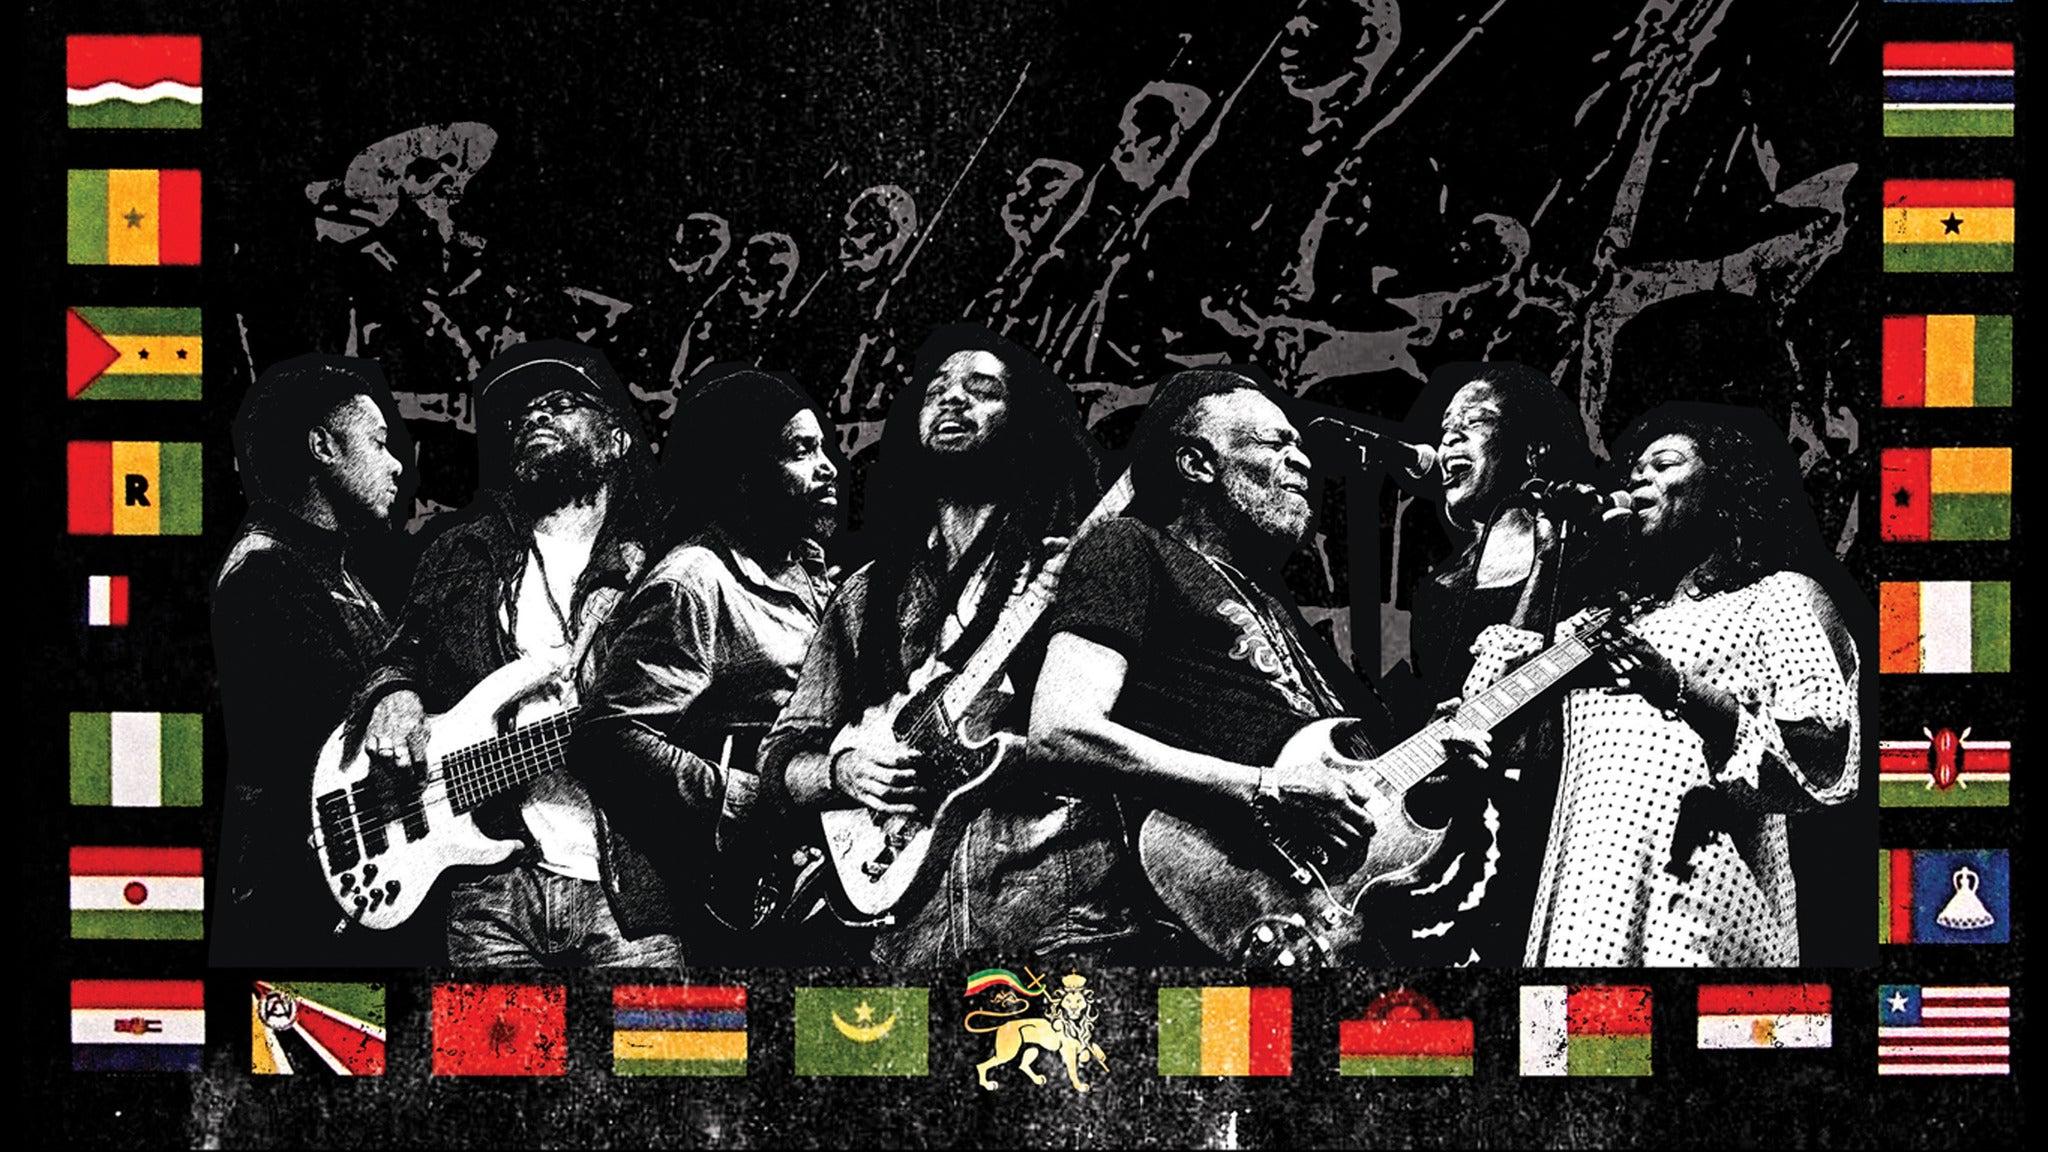 The Wailers 40th Anniversary of Survival at Saint Rocke